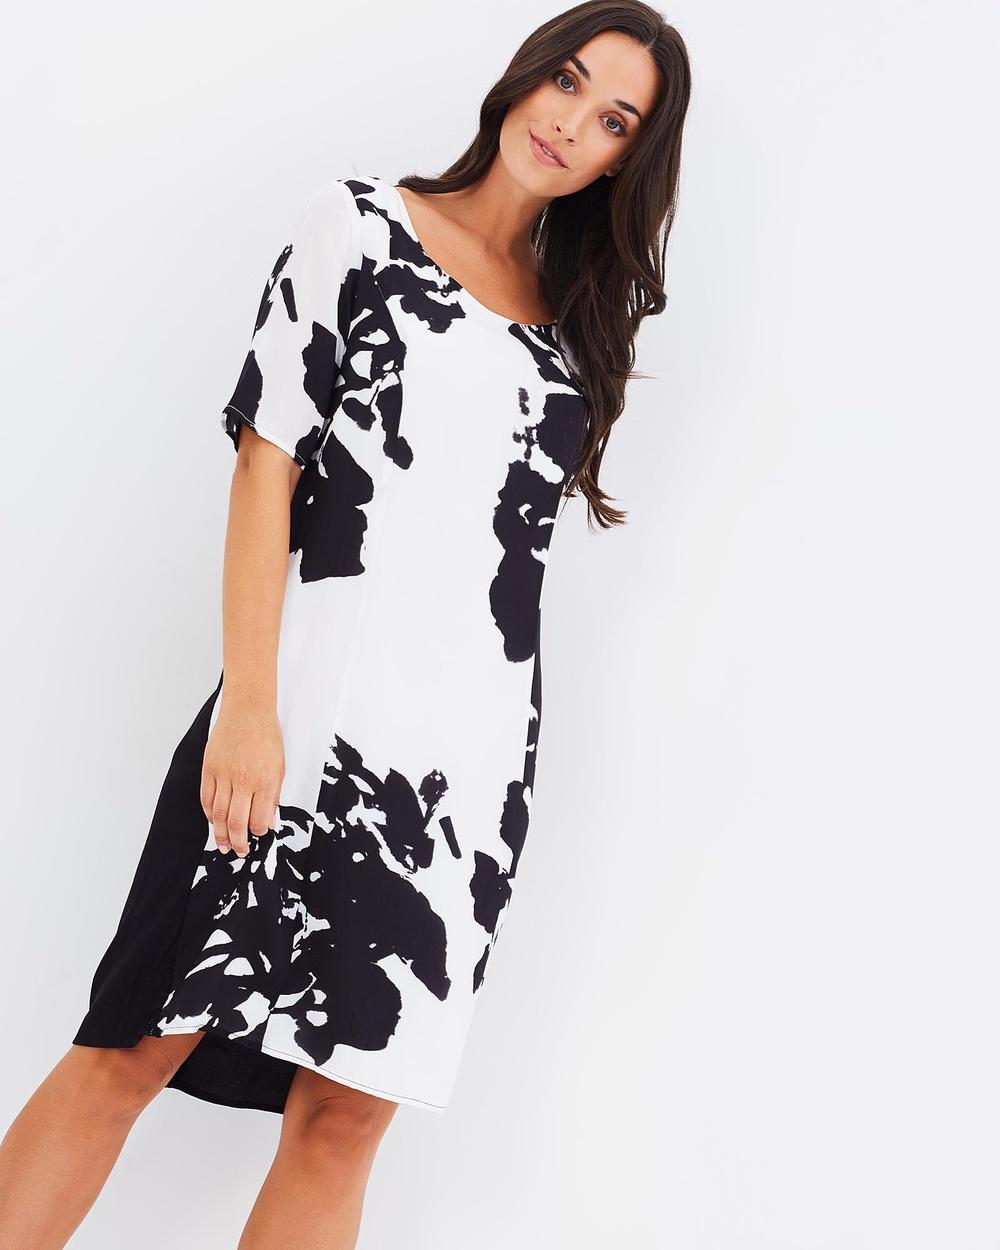 Faye Black Label Scoop Neck Dress Dresses Silhouette Scoop Neck Dress